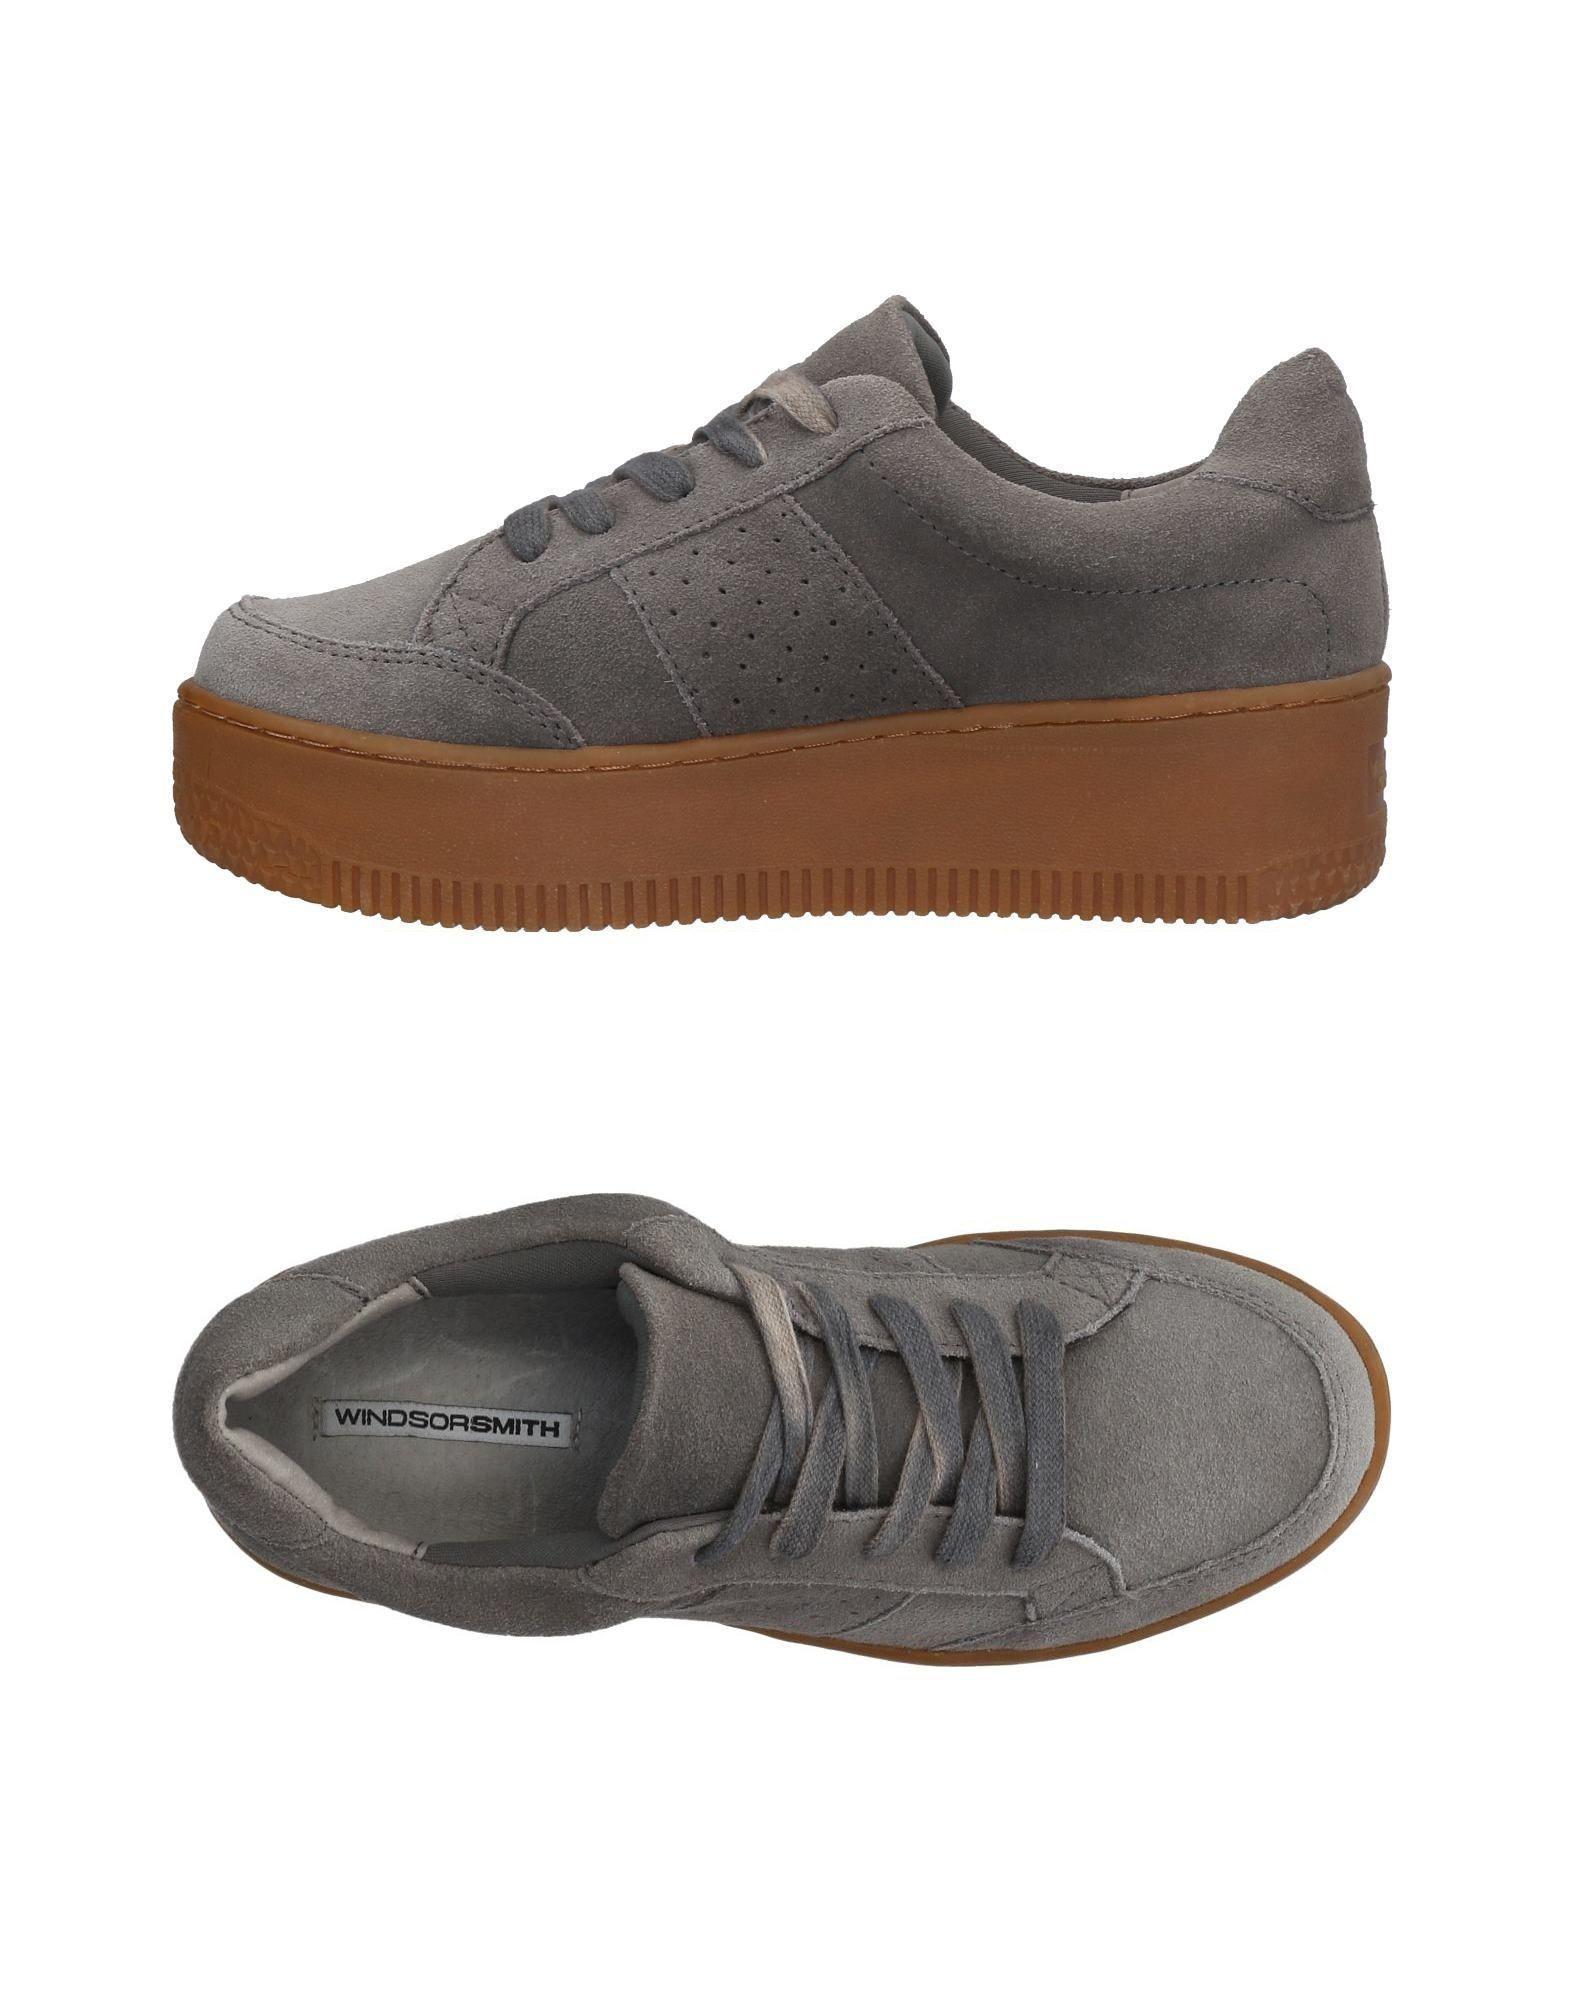 Windsor Smith Bas-tops Et Chaussures De Sport mAwkST